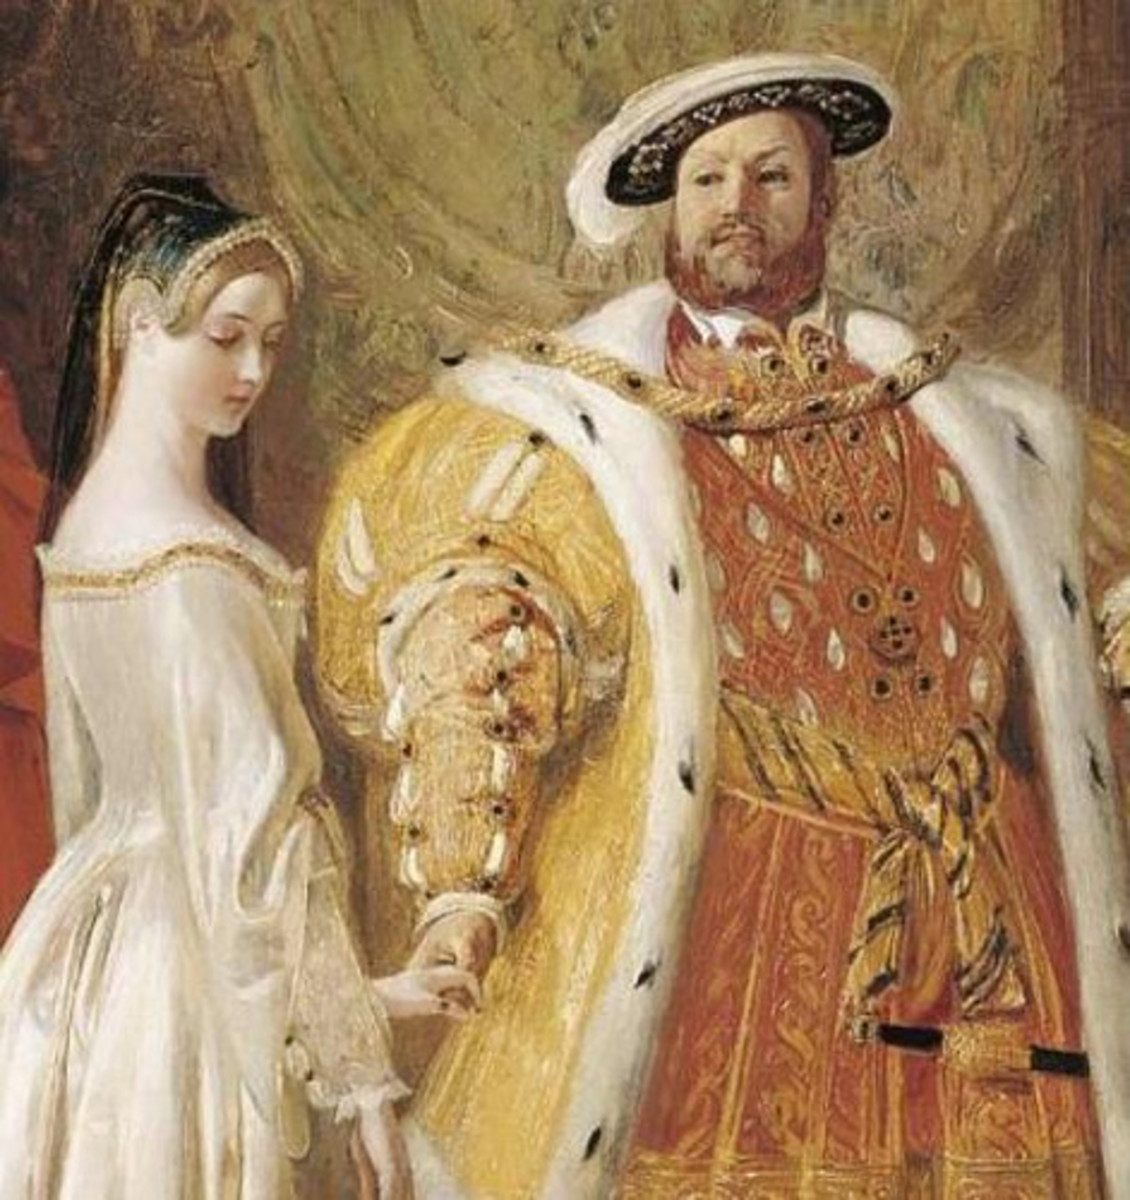 Henry VIII timeslip parallel worlds.